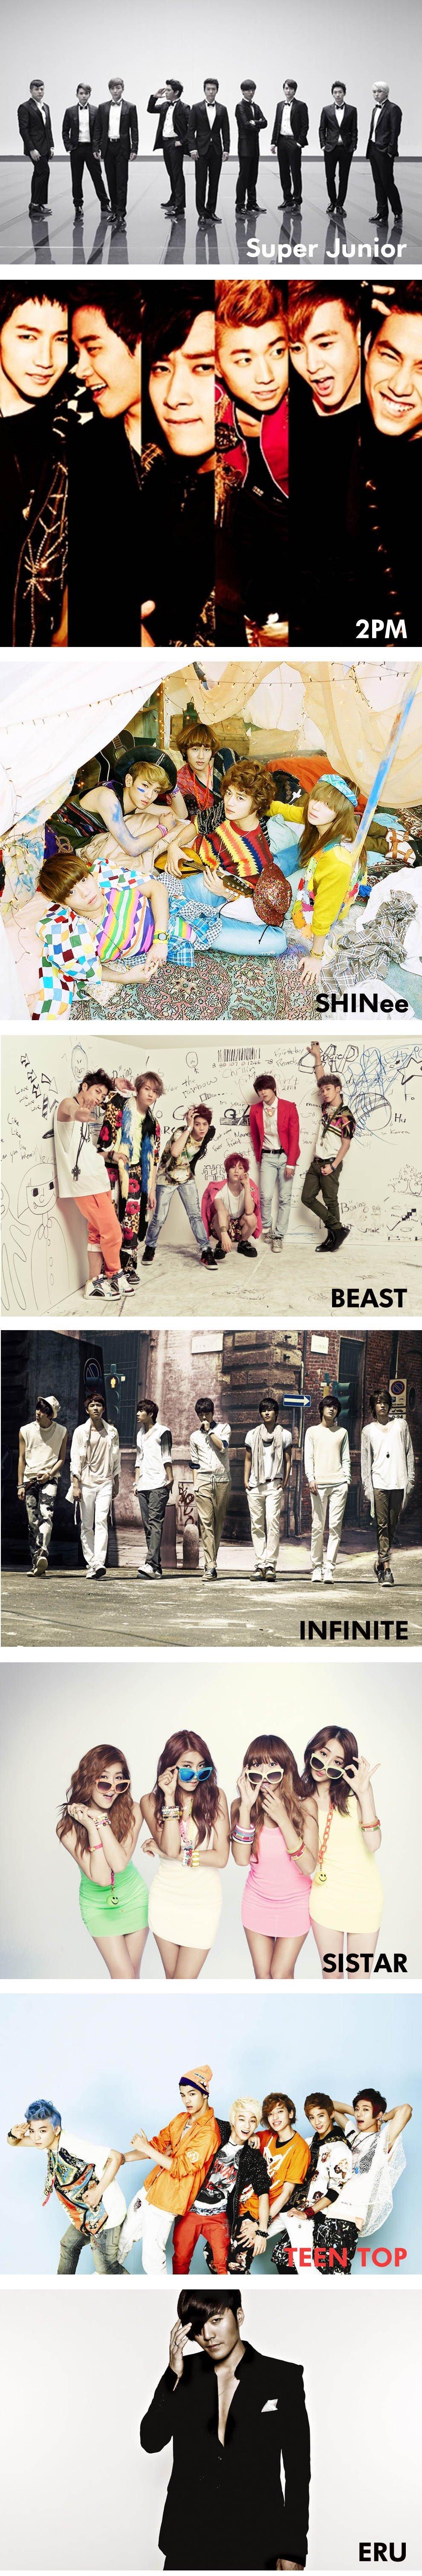 KBS MusicBank World Tour - Super Junior - SHINee - 2PM - Beast - Infinite - Sistar - Teen Top - Eru